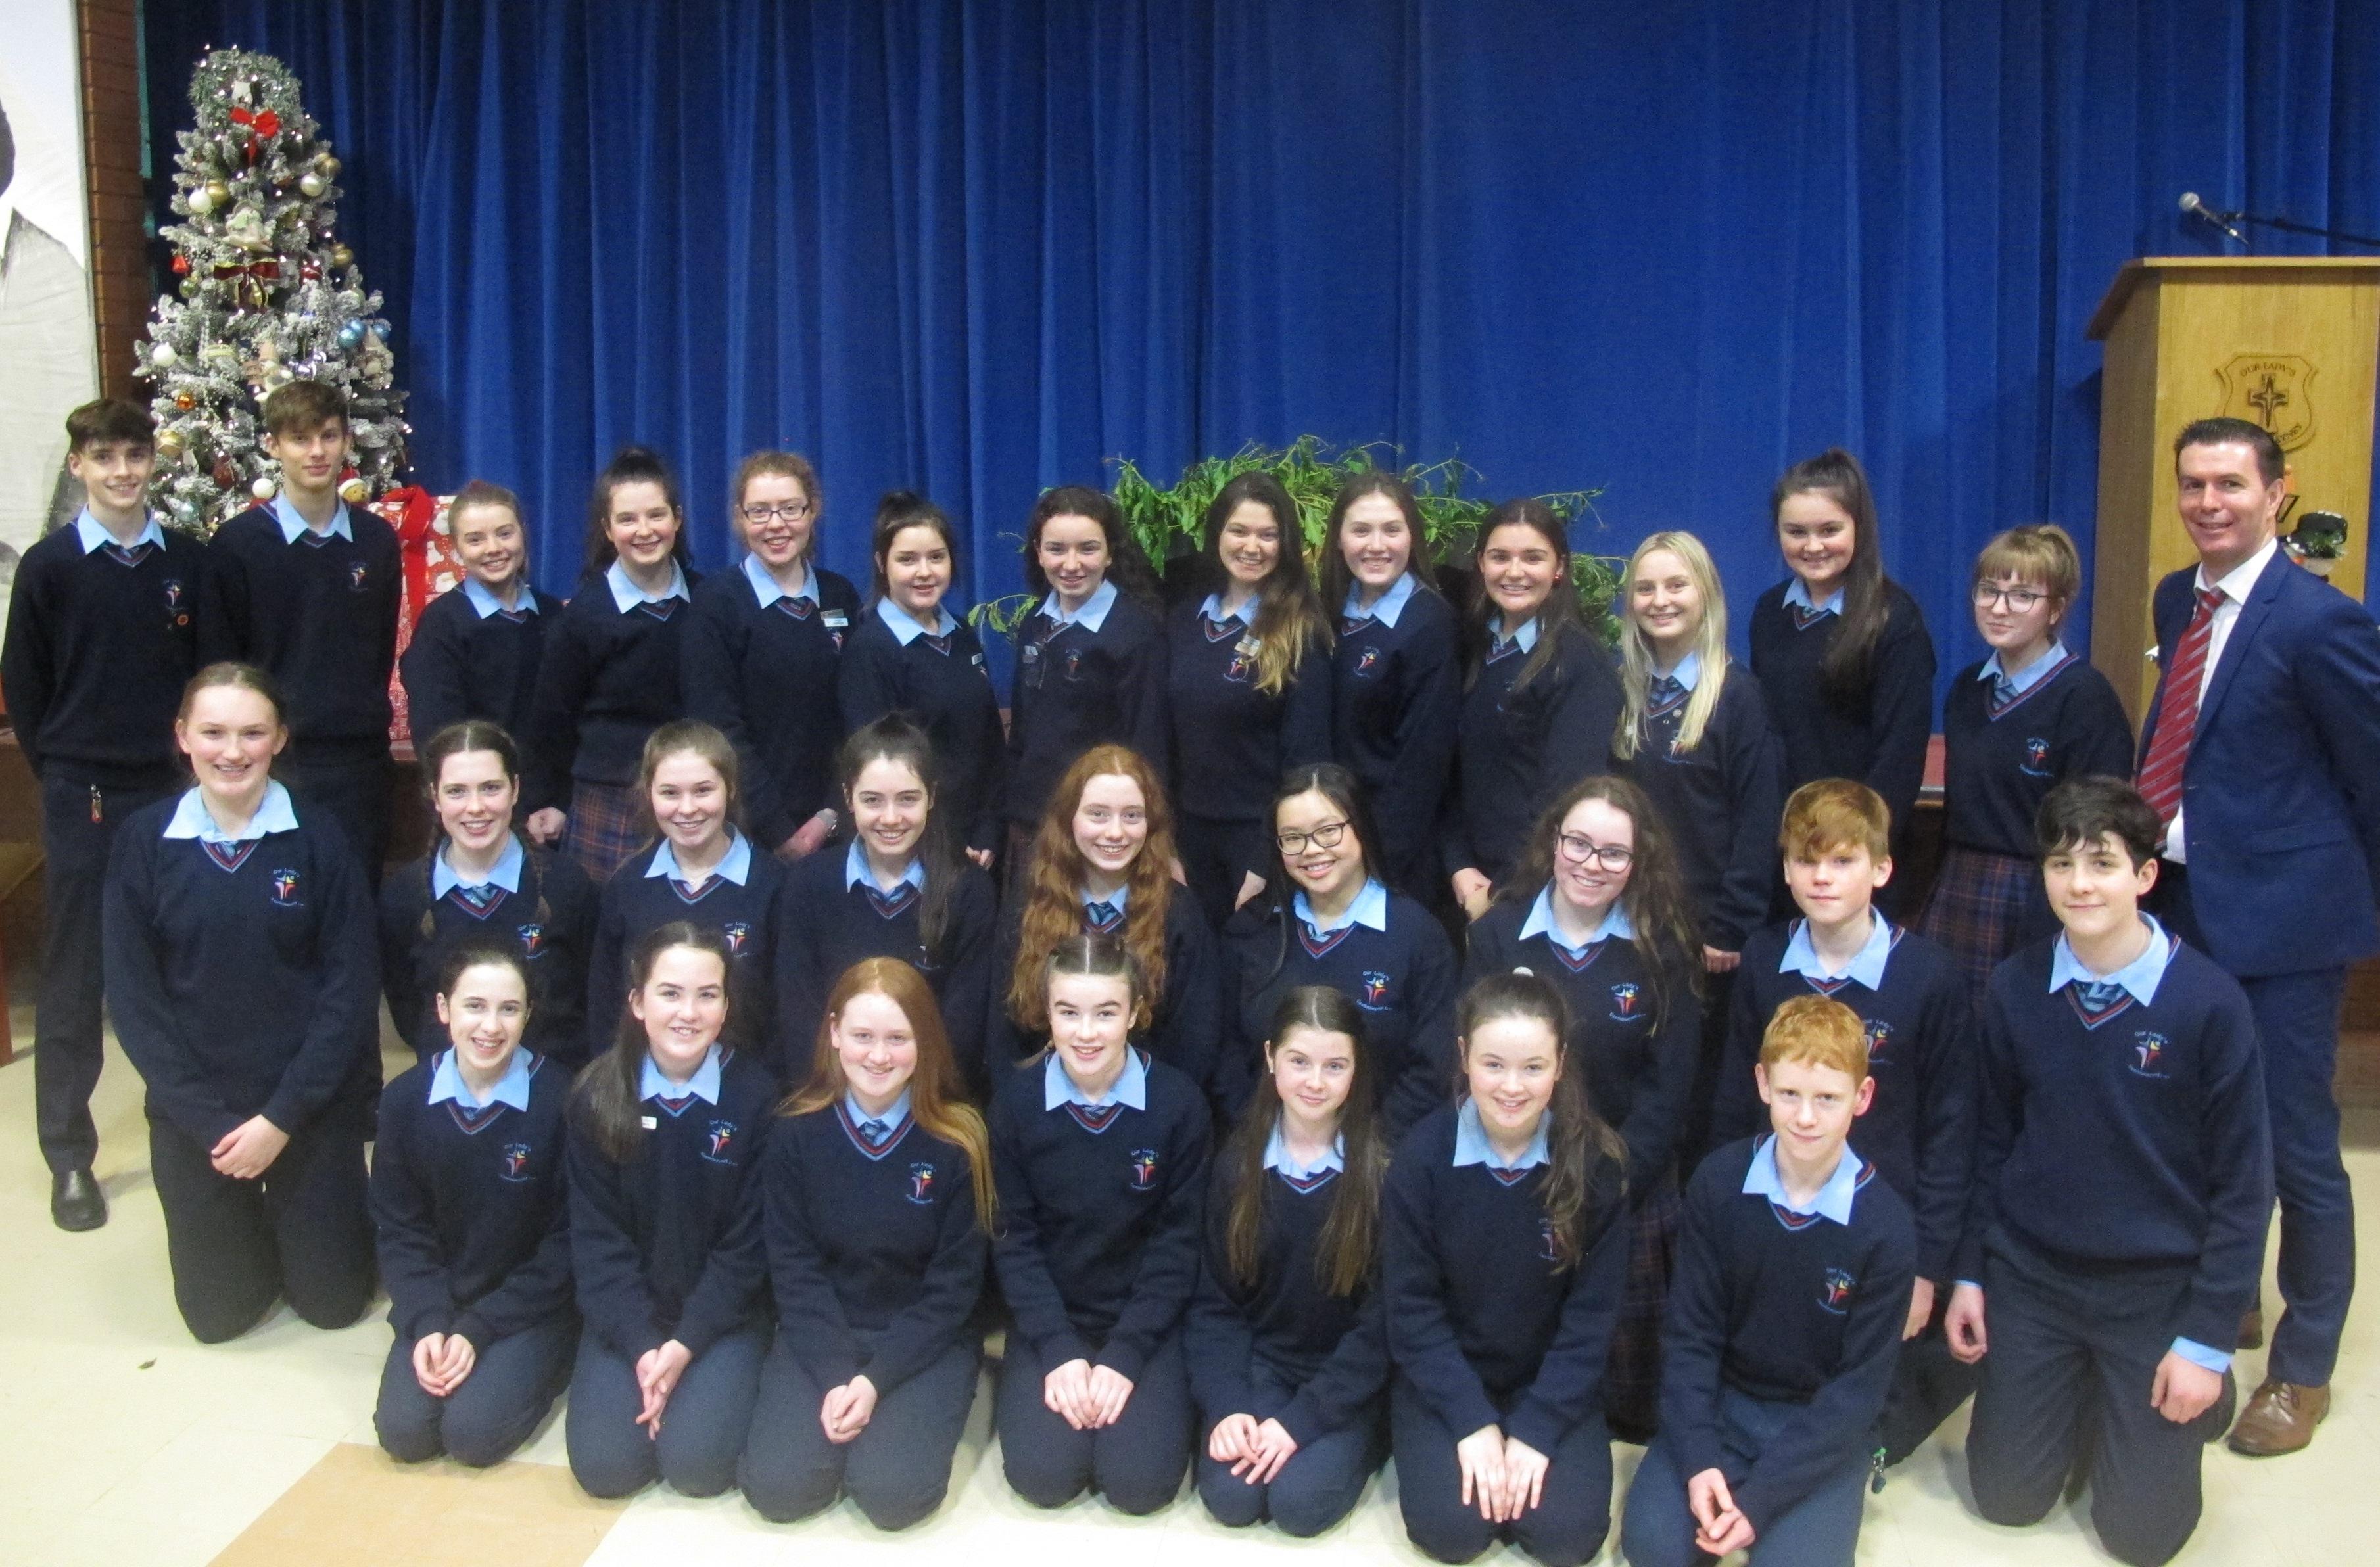 Gaisce Award - Castleblayney College